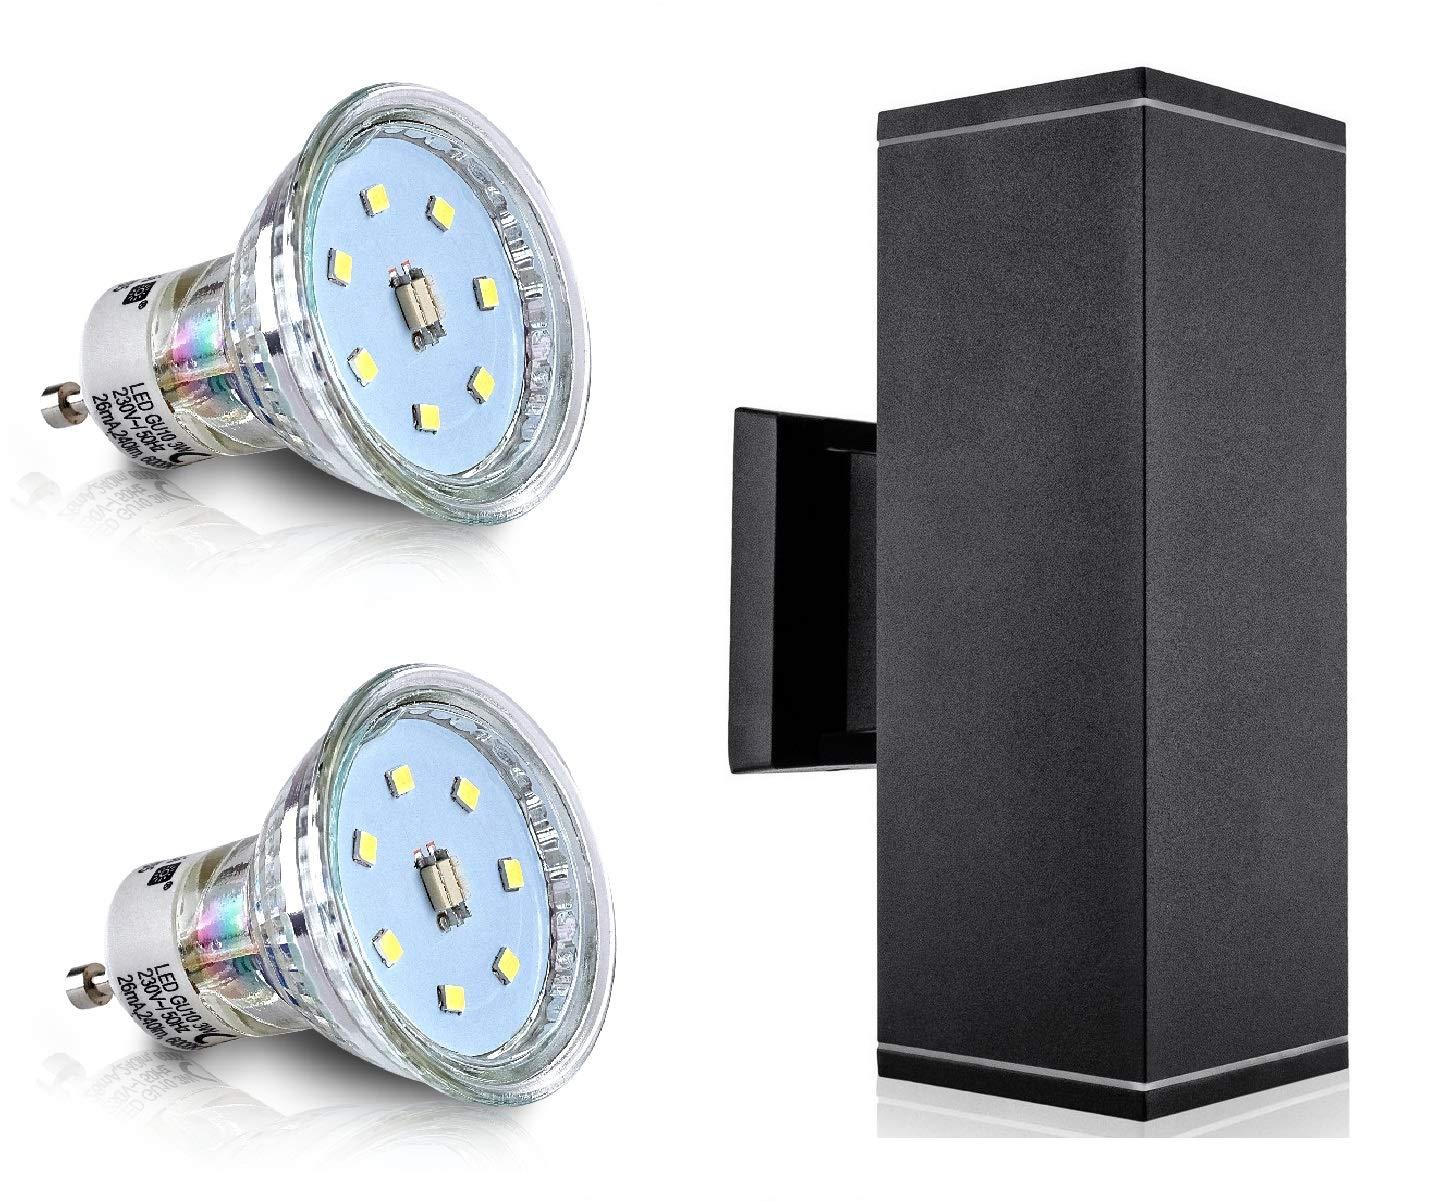 LED Aussenleuchte Aussenlampe Wandlampe Schwarz Wandleuchte PanderLights BILBAO IP44 CE (2x 4W Warmweiß)